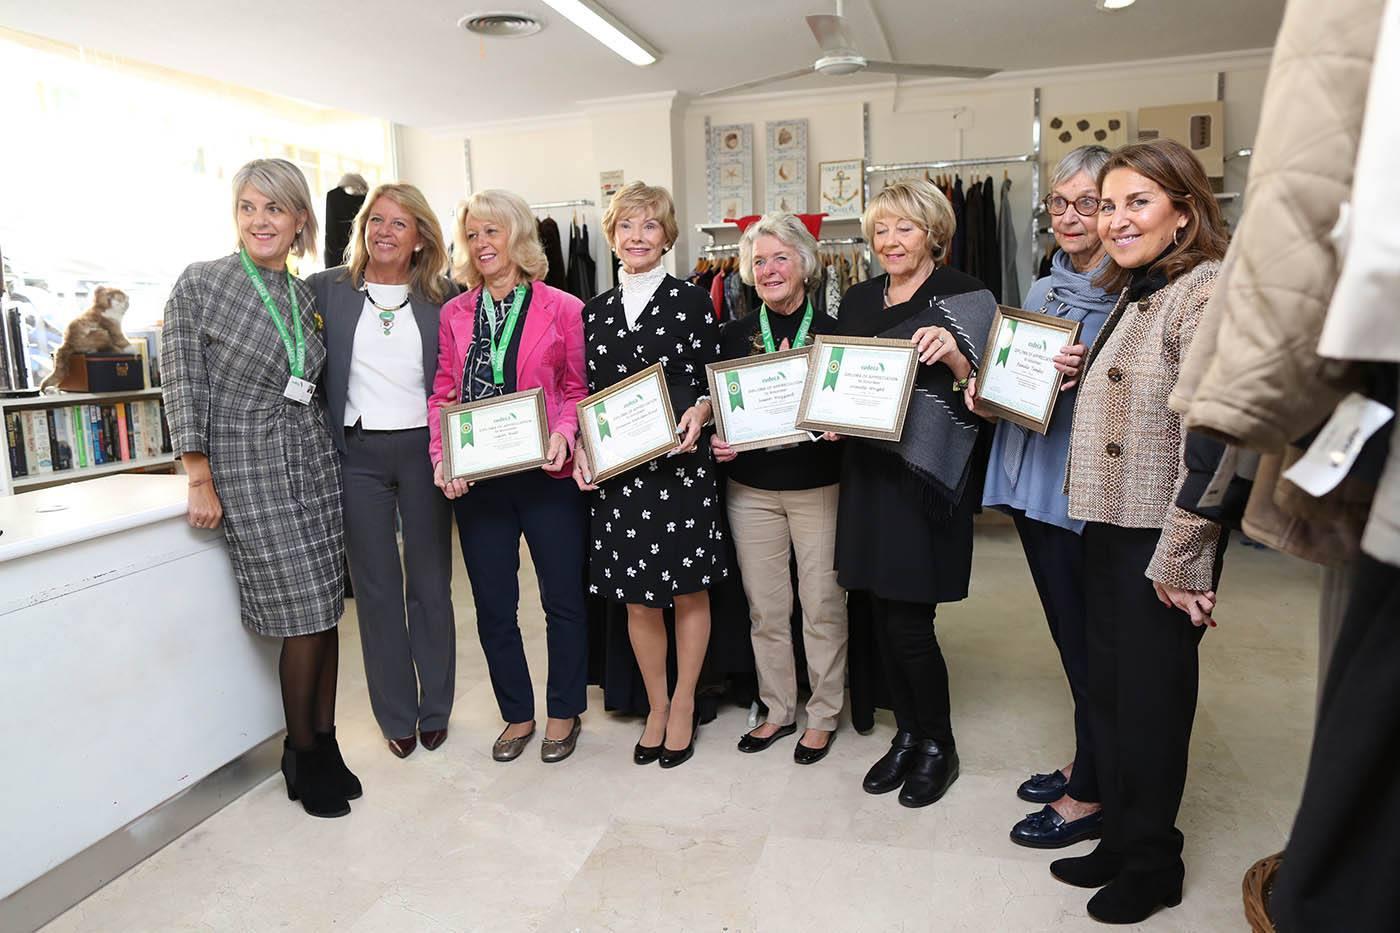 Marbella recognises our volunteers